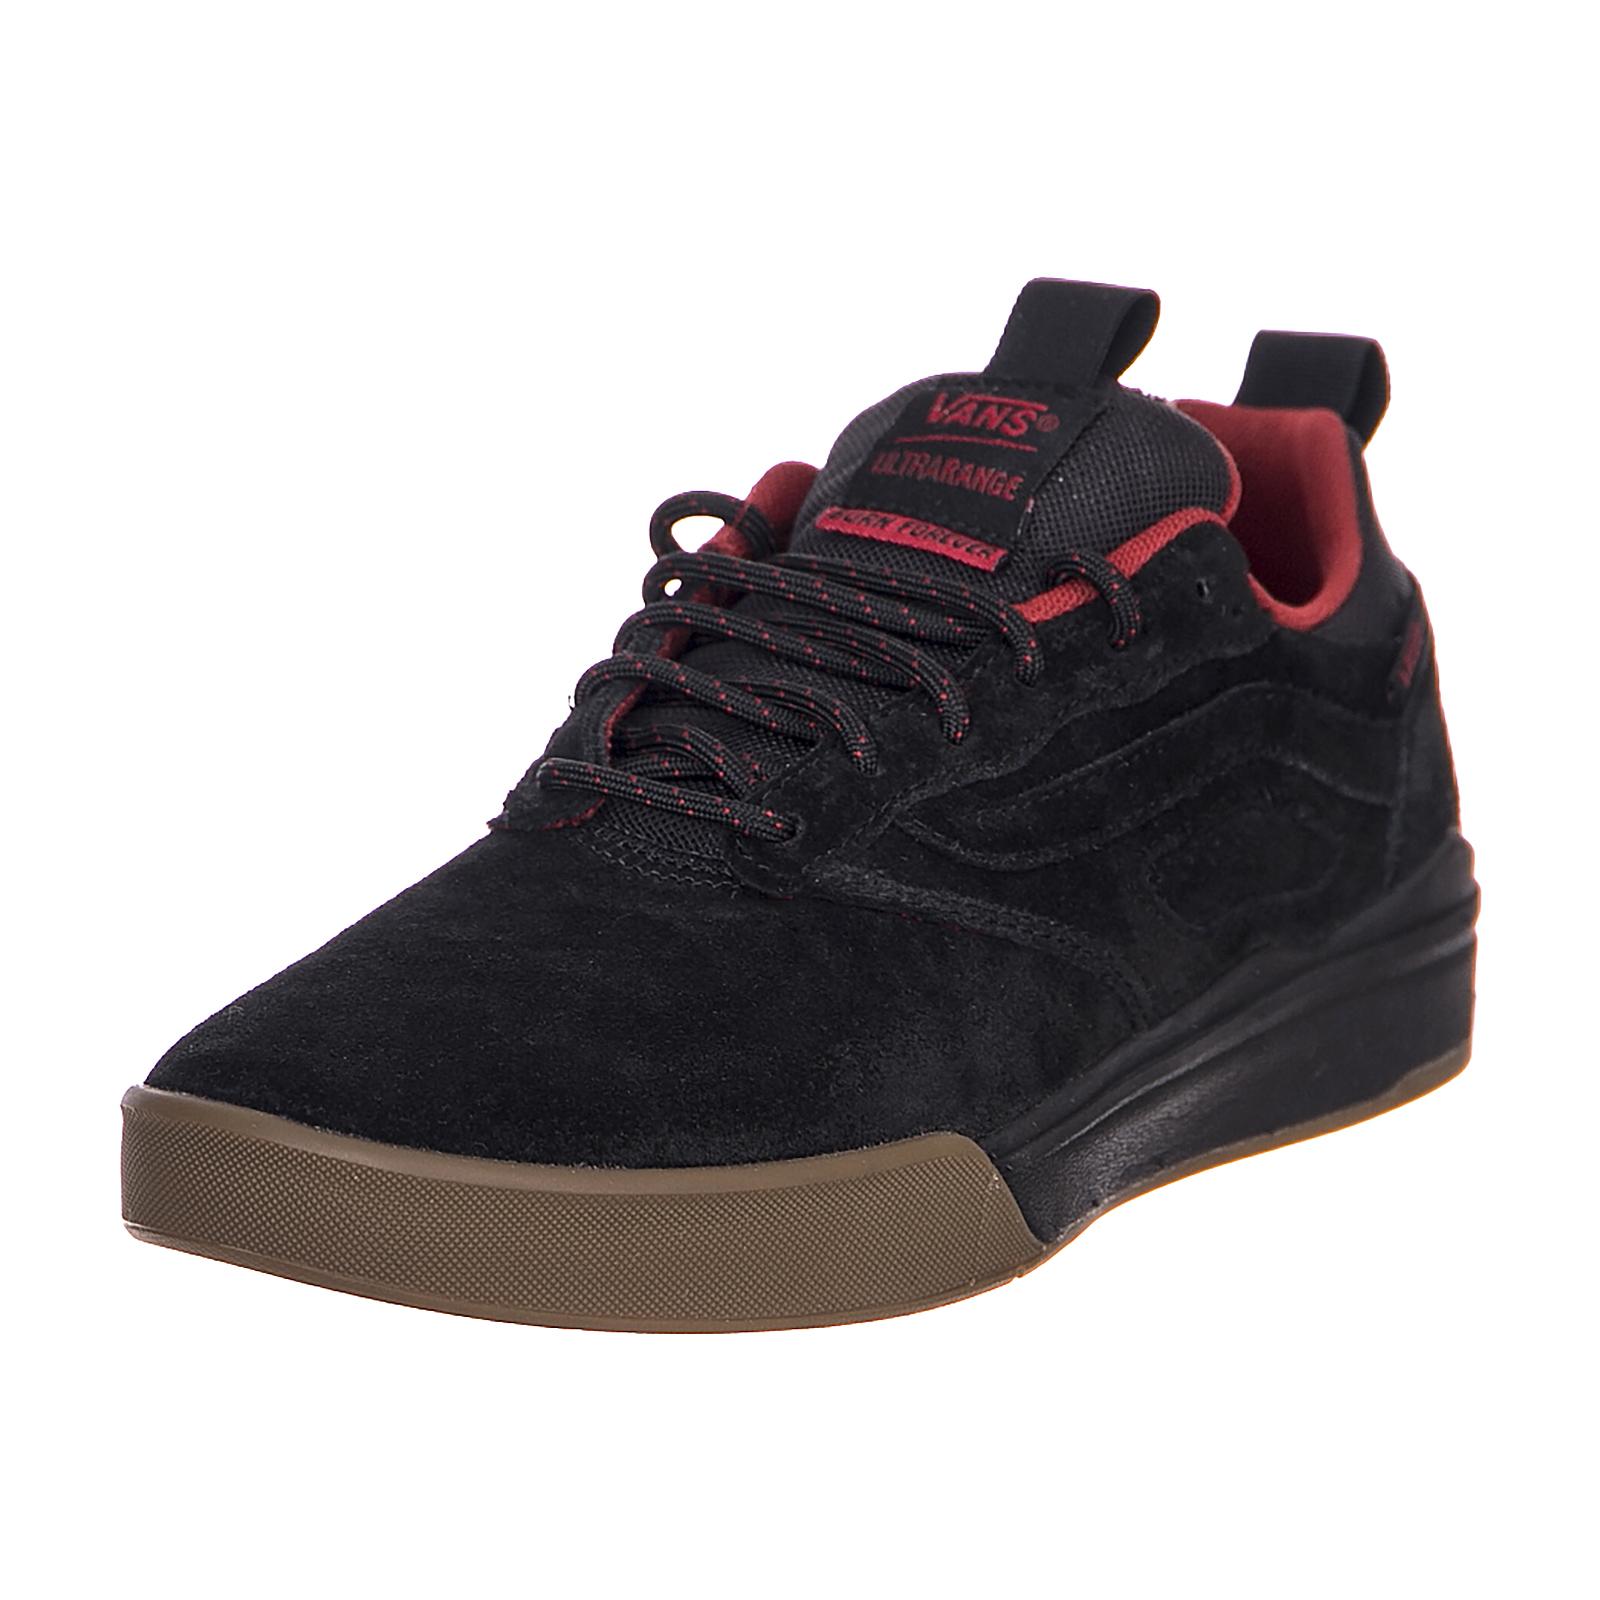 Vans Sneakers Mn Ultrarange Pro (Spitfire) Black